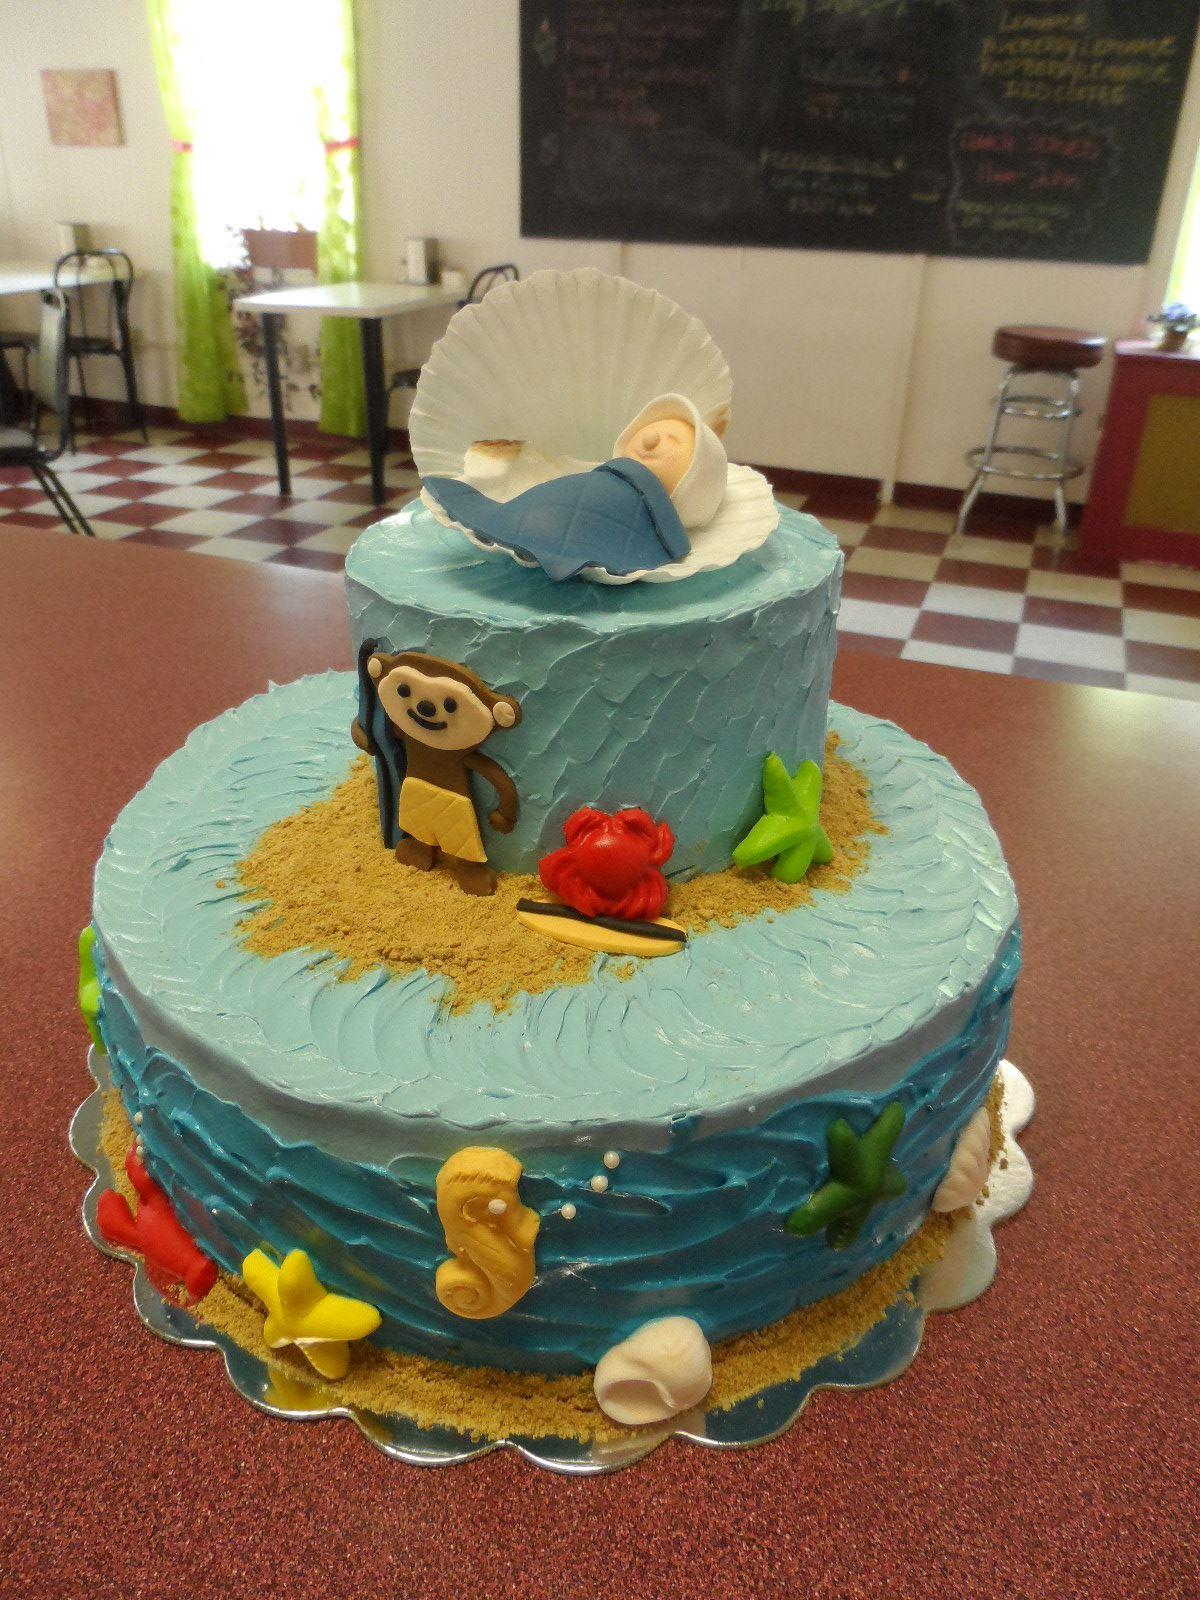 Classy Cakes Cupcakery cake